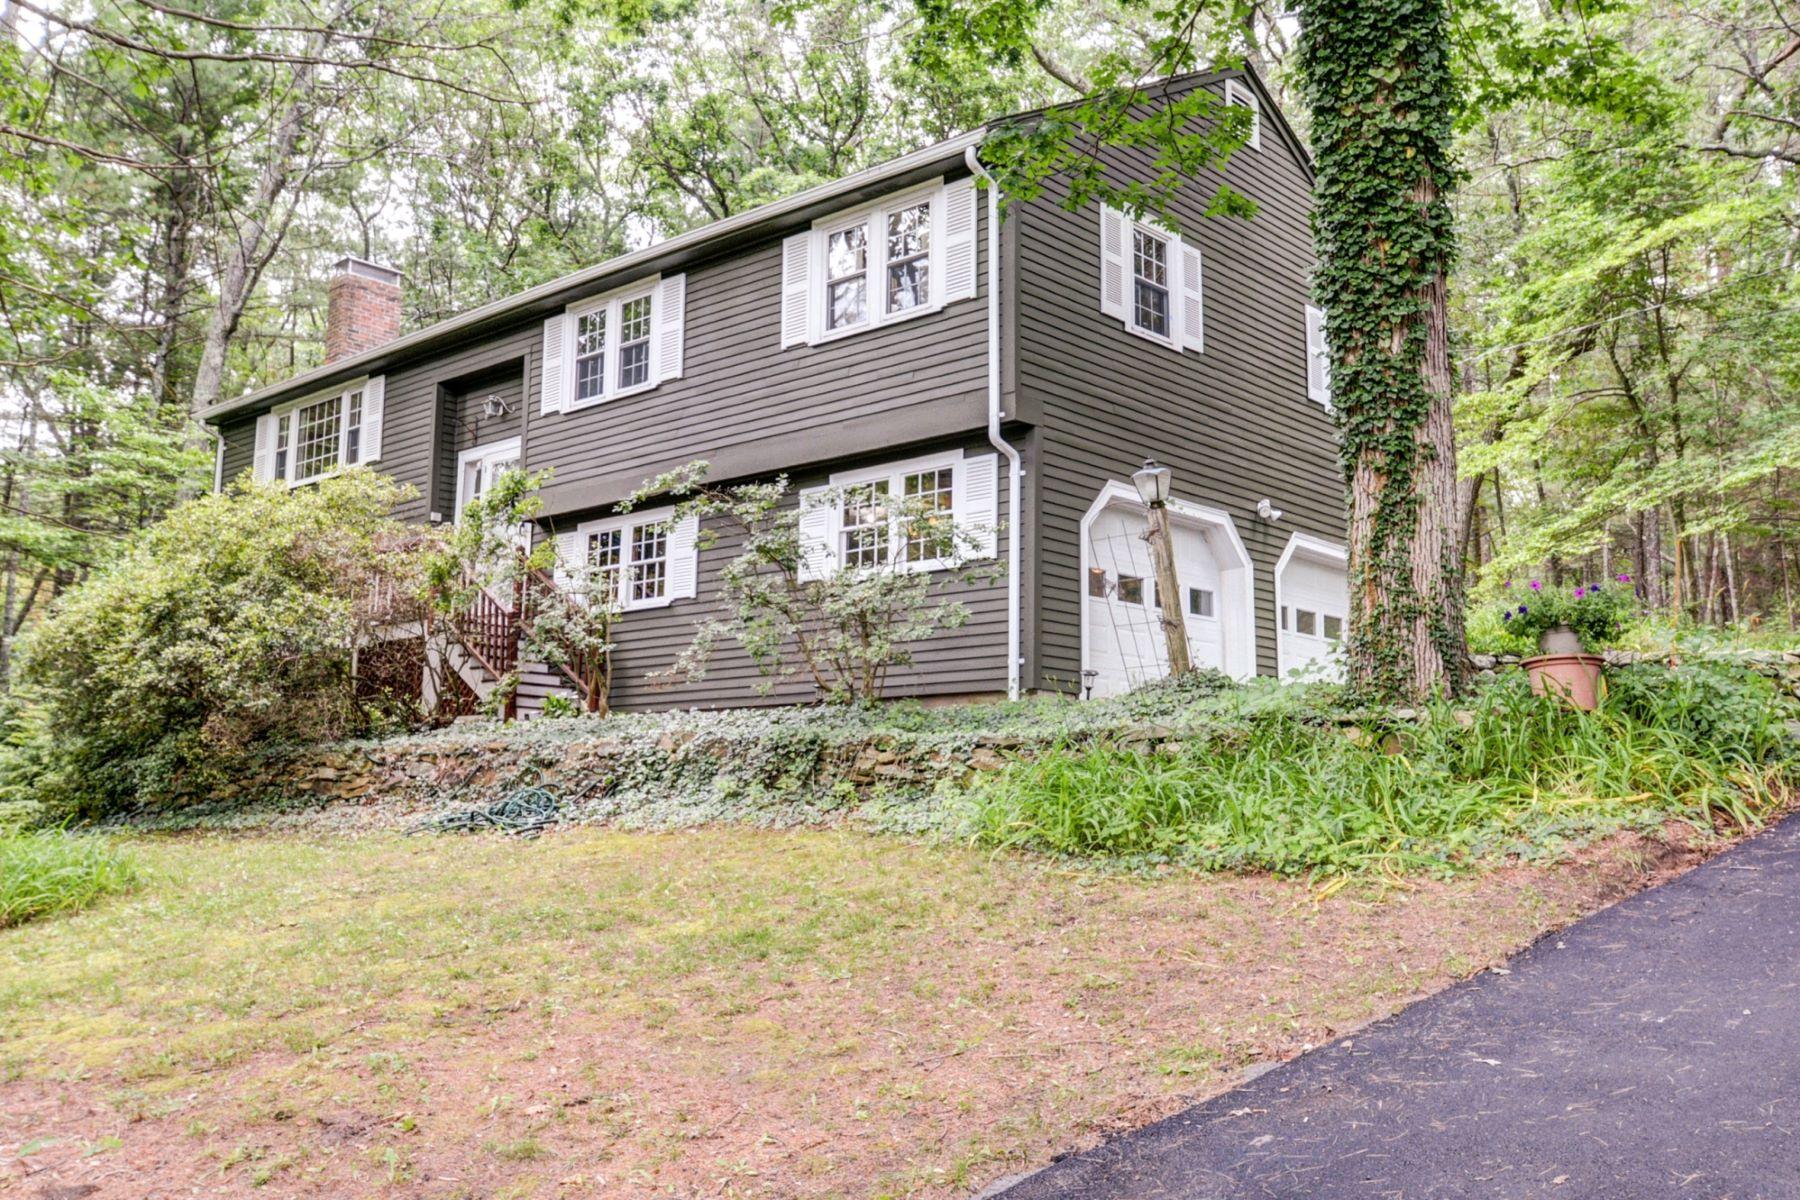 Moradia para Venda às Fox Run Neighborhood 554 Springs Road Bedford, Massachusetts, 01730 Estados Unidos